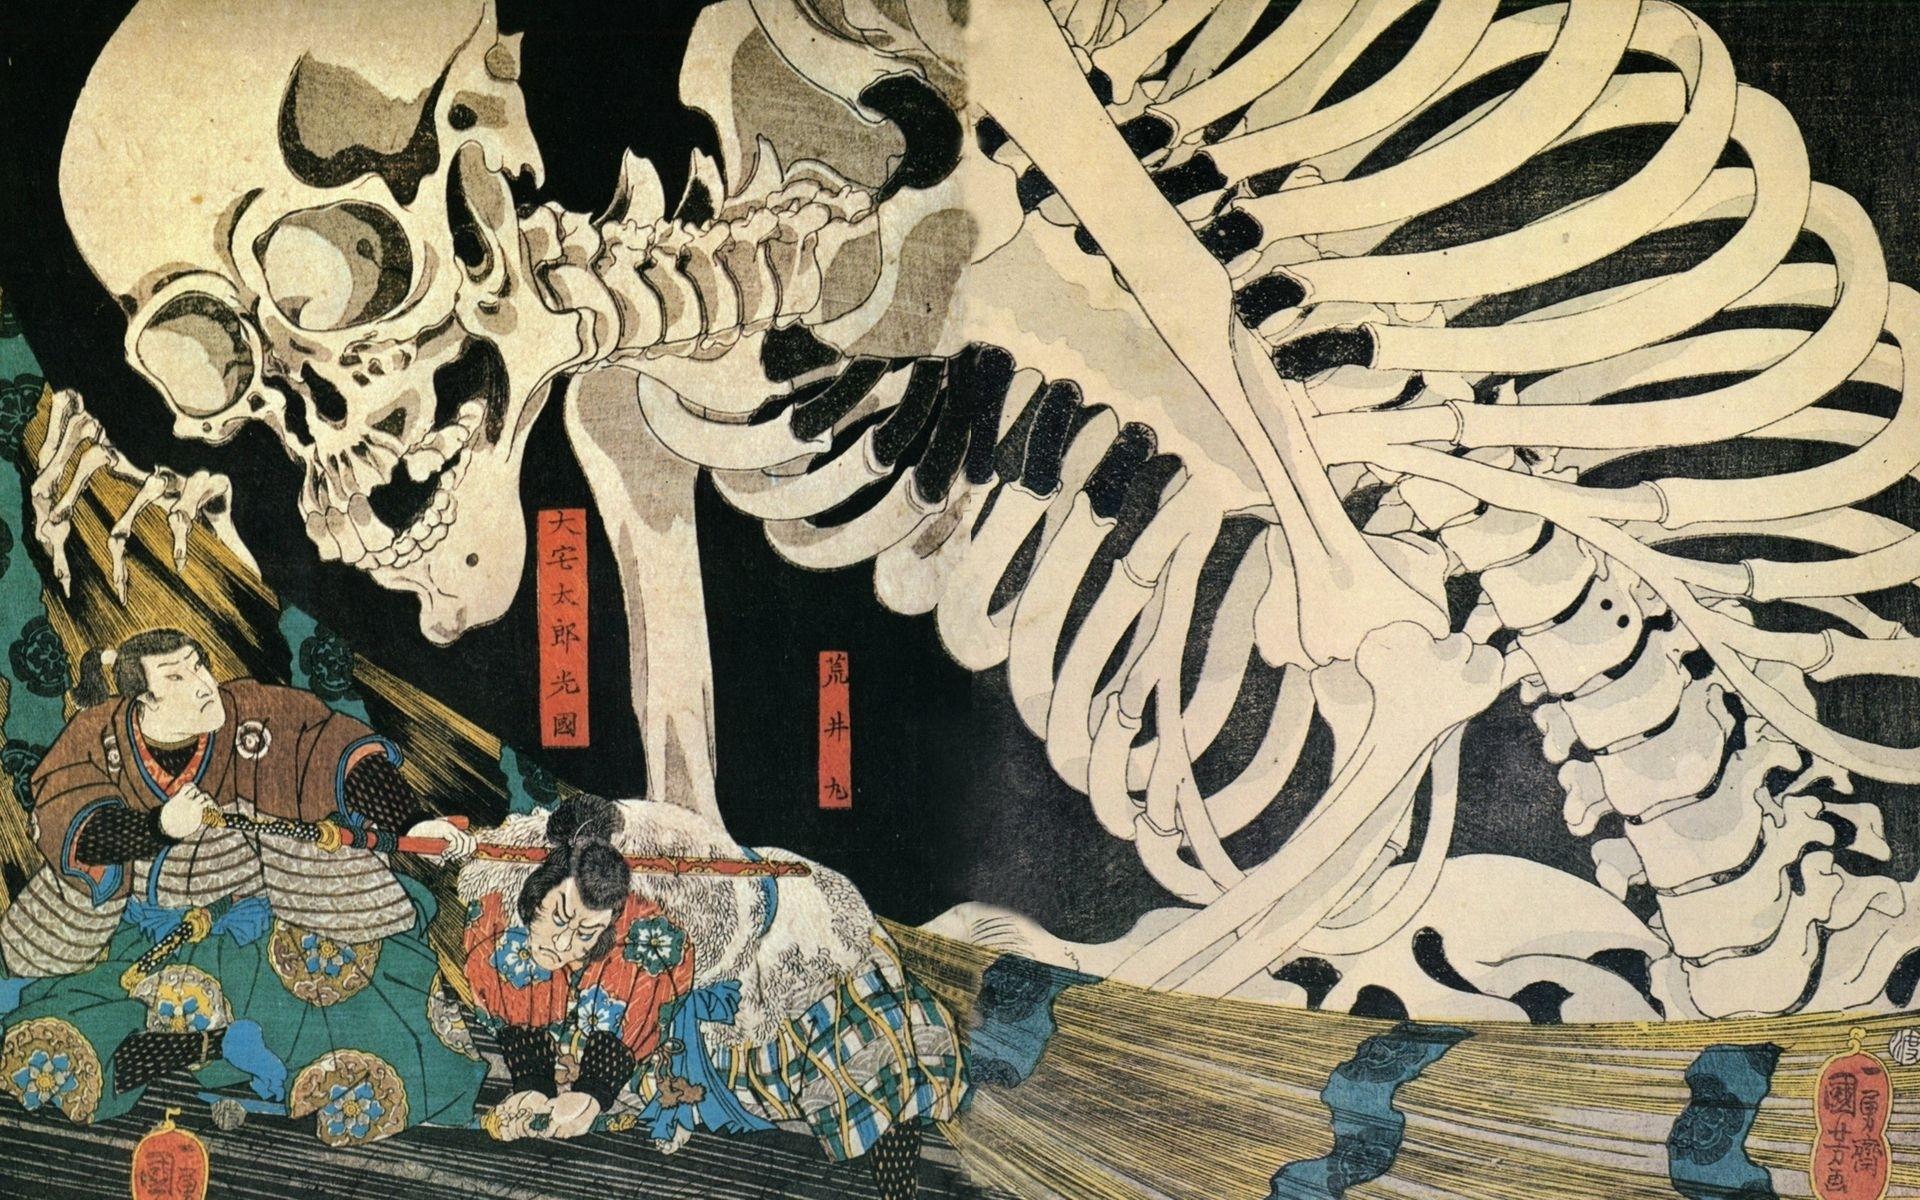 japanese ghost art | samurai art ukiyo e hd wallpaper with 1920x1200